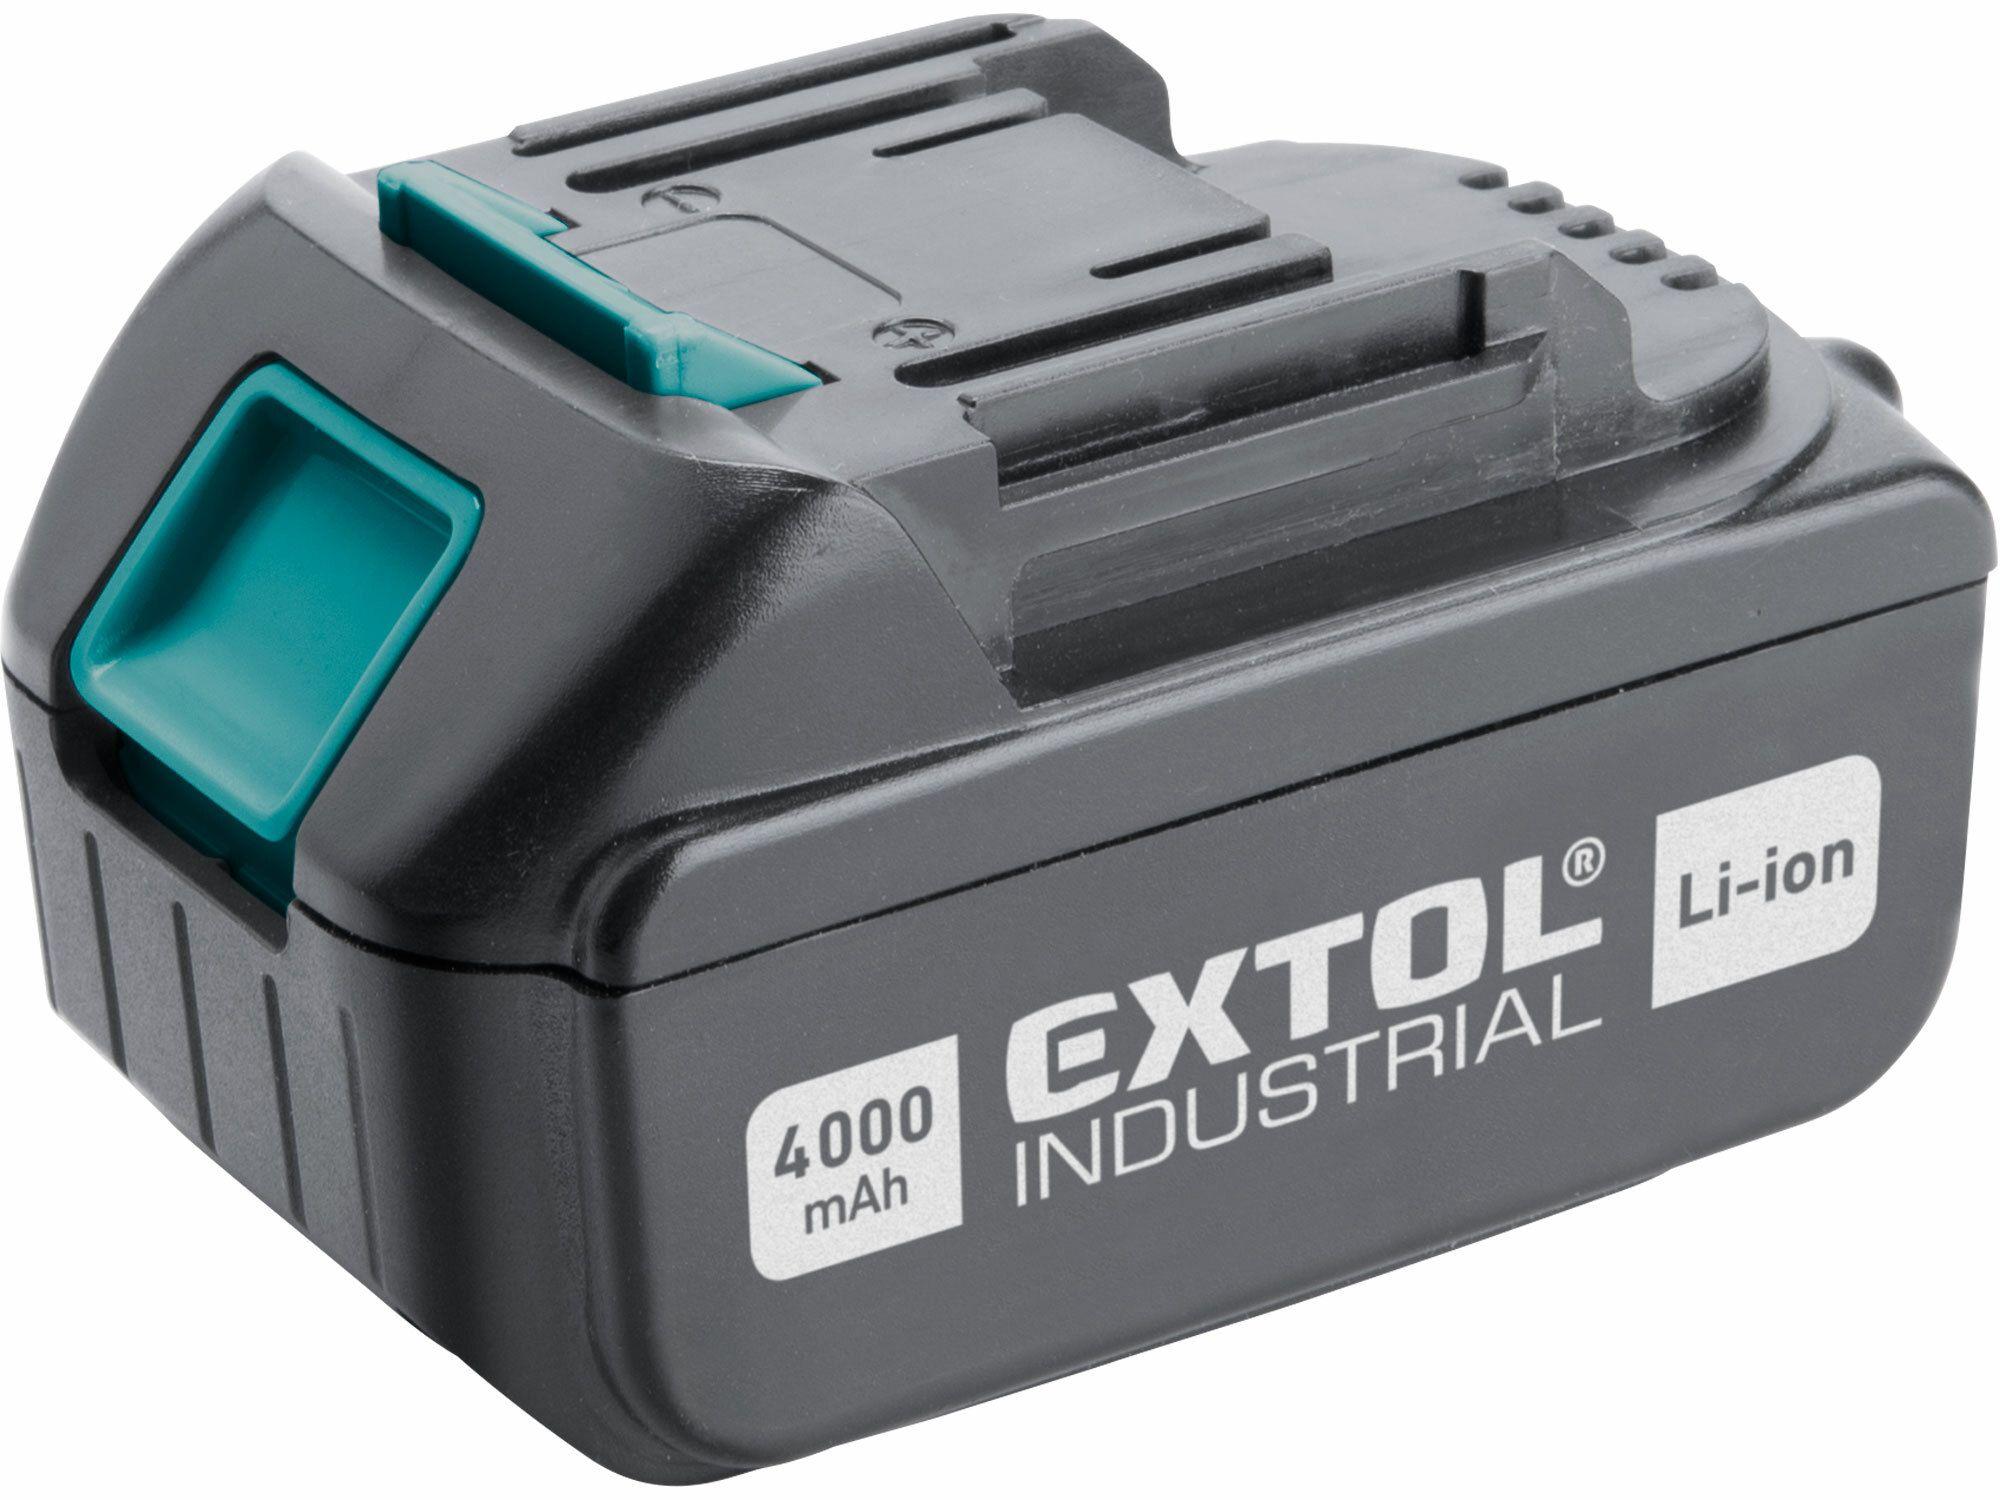 Baterie akumulátorová 18V, Li-ion, 4000mAh EXTOL INDUSTRIAL